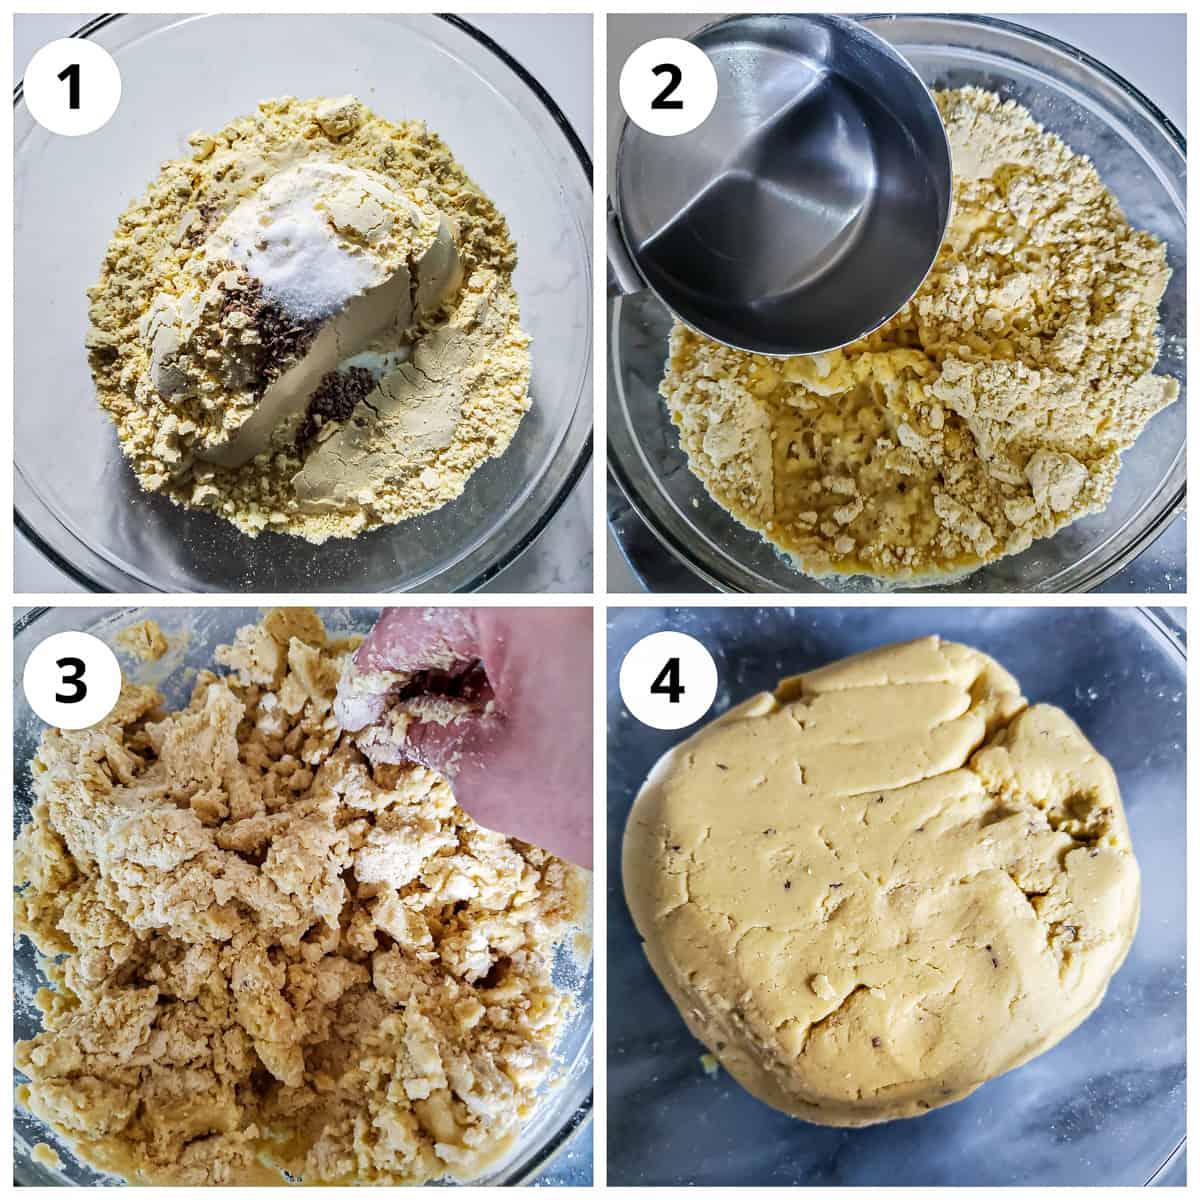 Steps to make makki ki roti dough by adding water and kneading